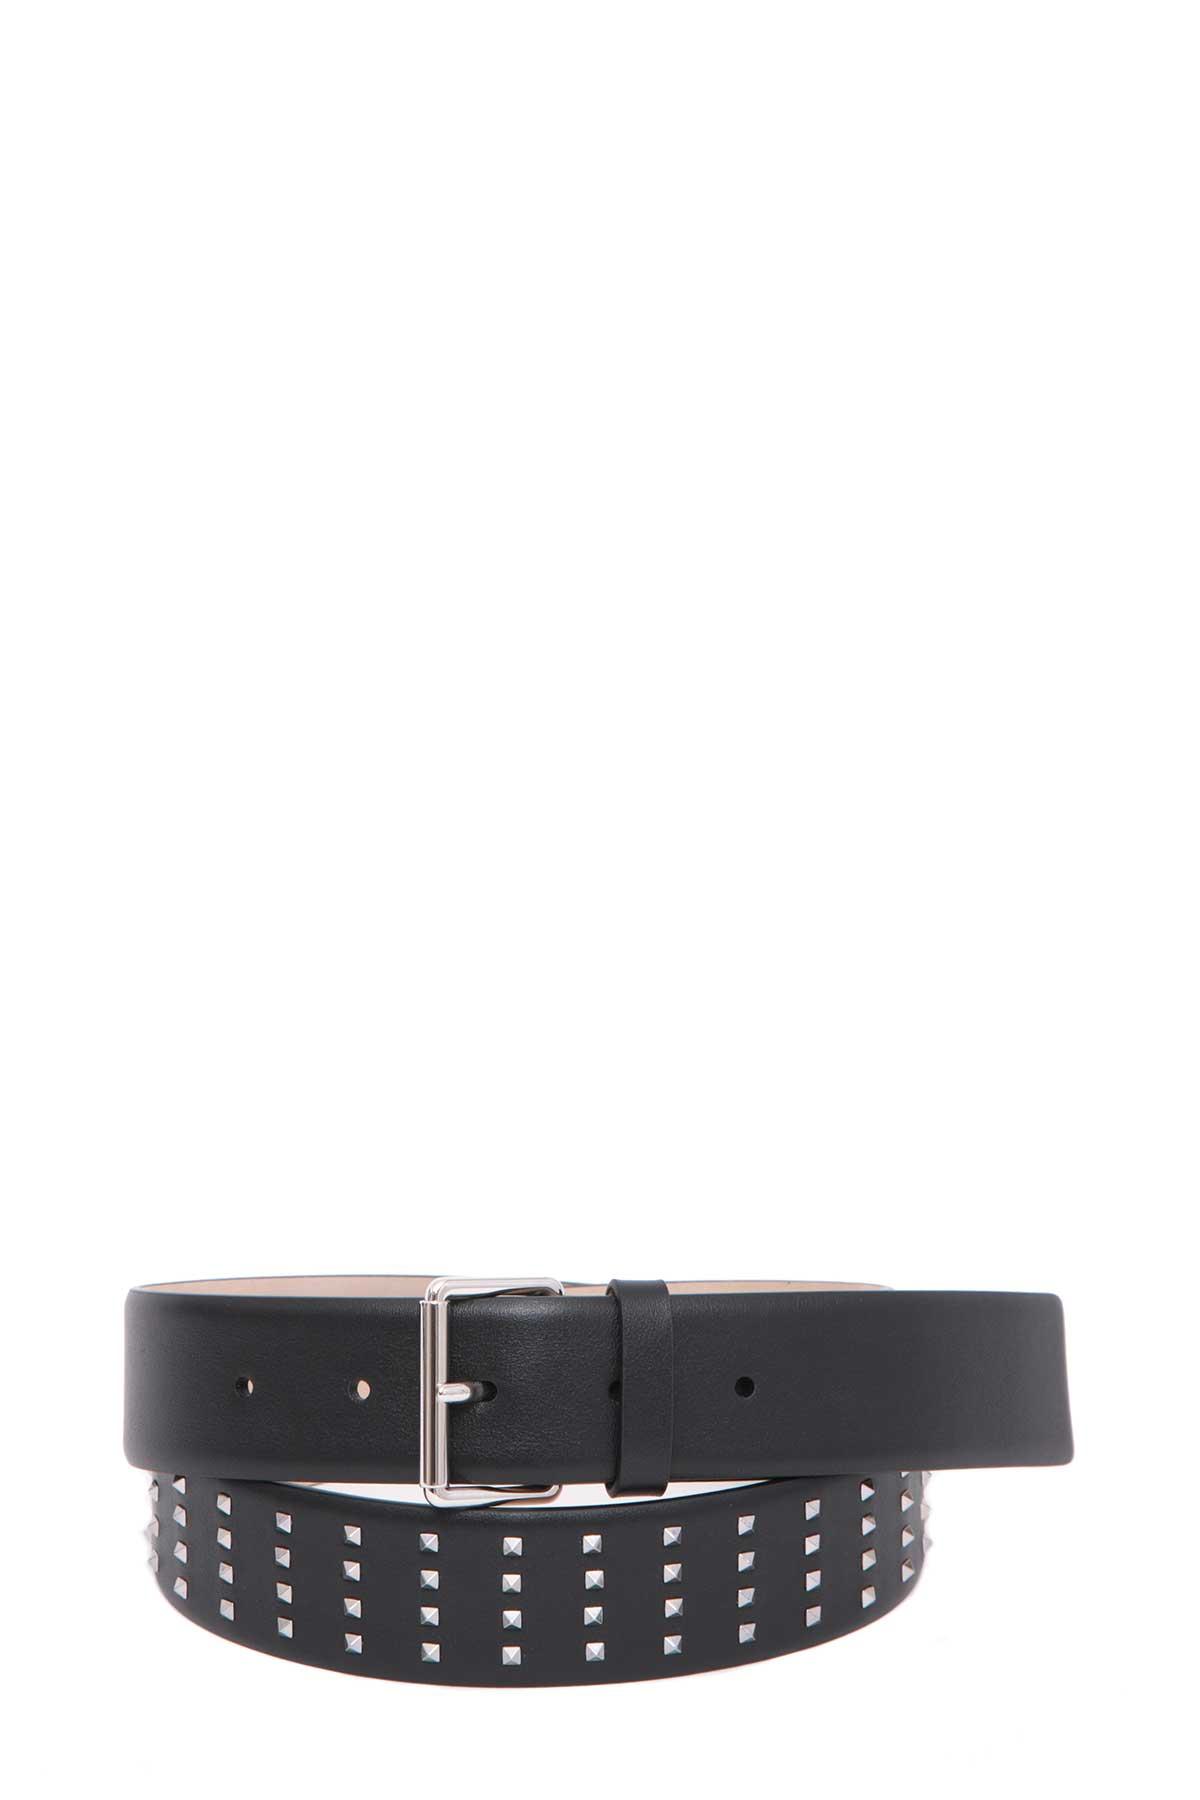 Valentino Garavani Valentino Garavani Belt With Studs